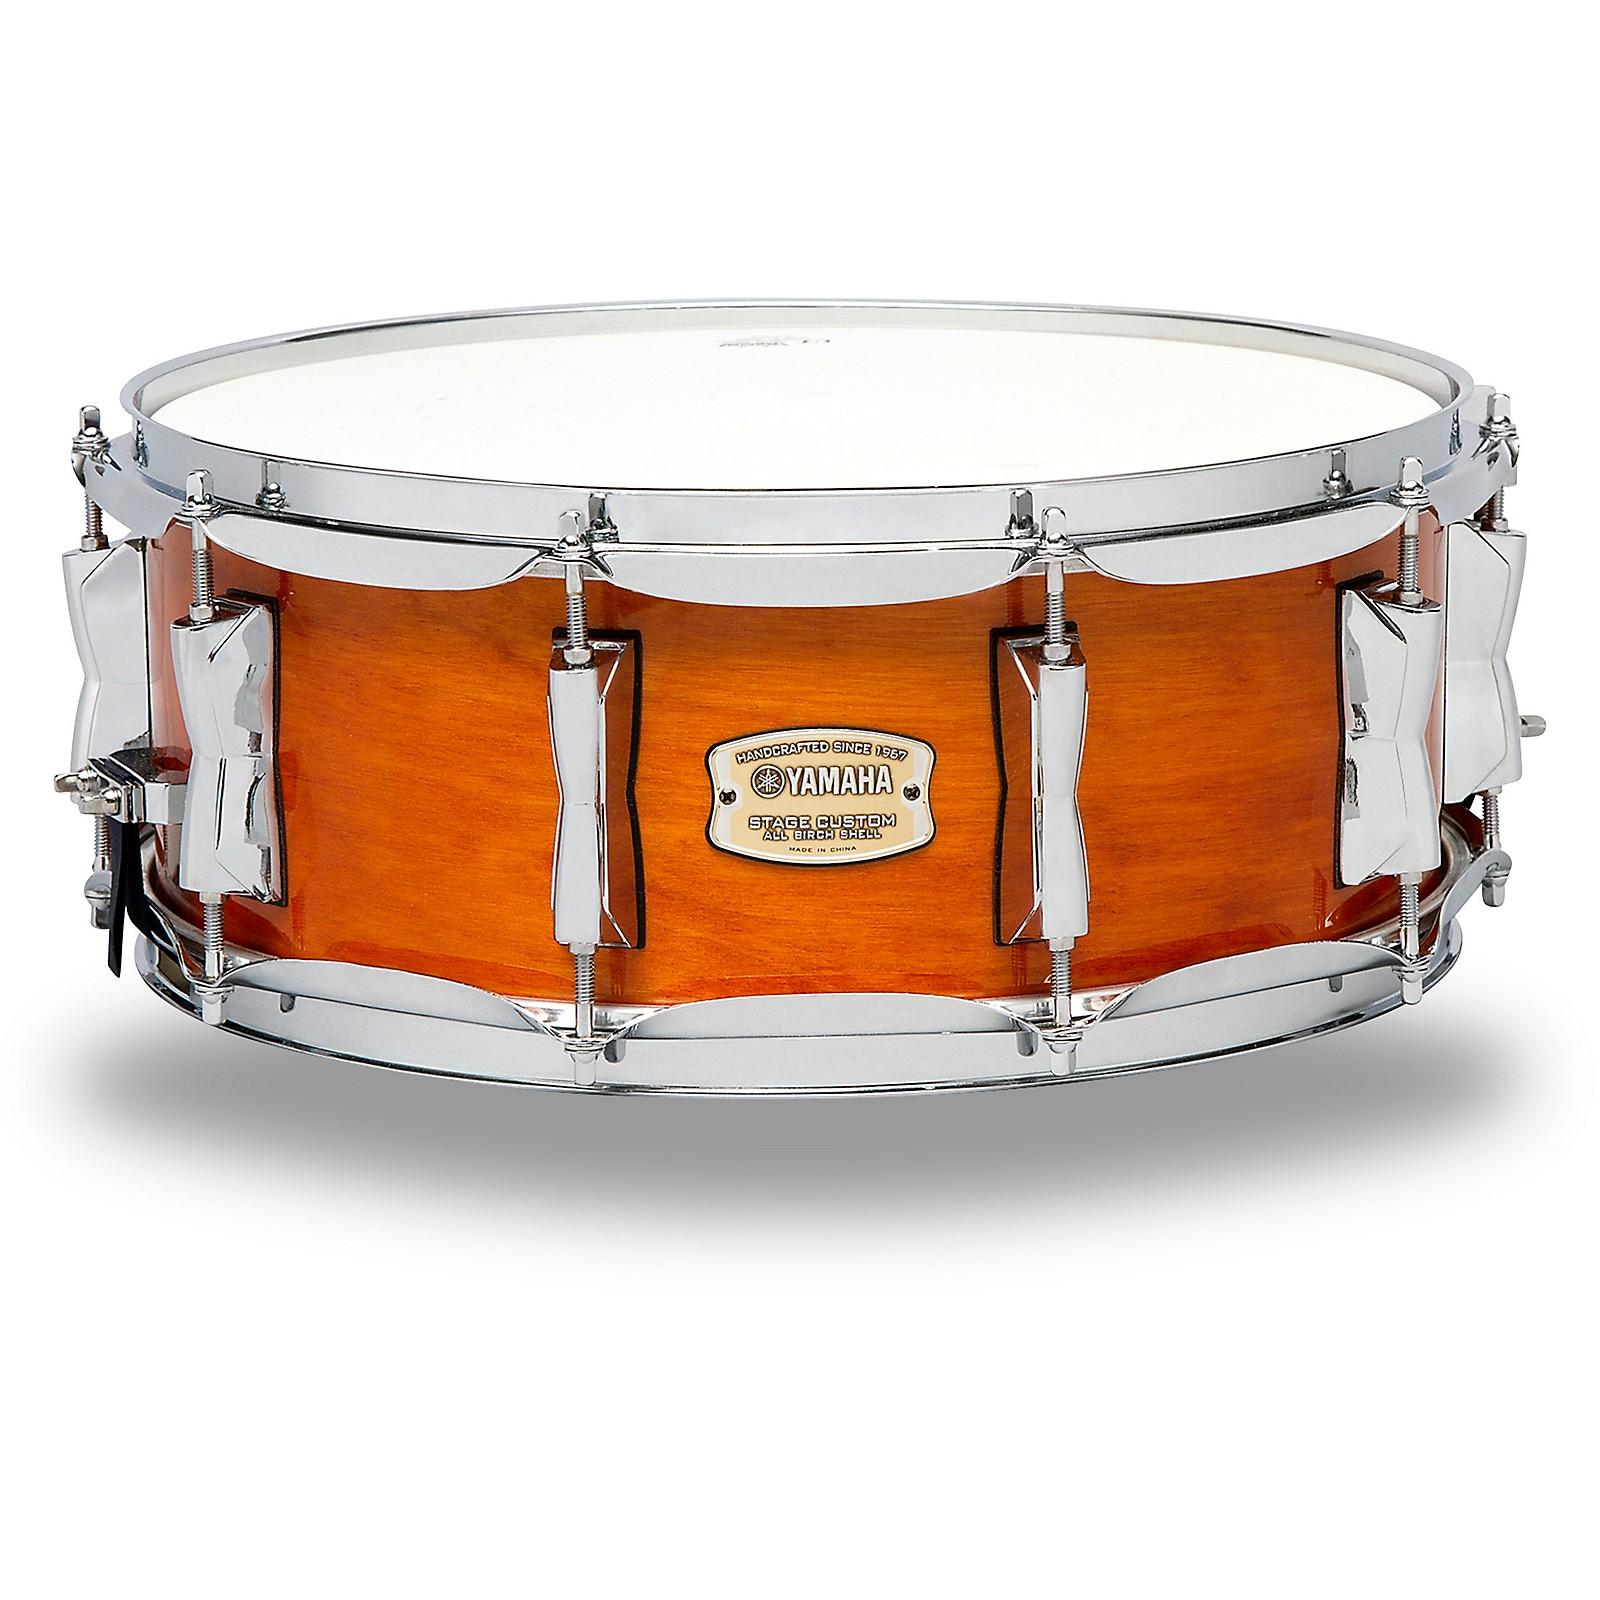 Yamaha Stage Custom Birch Snare